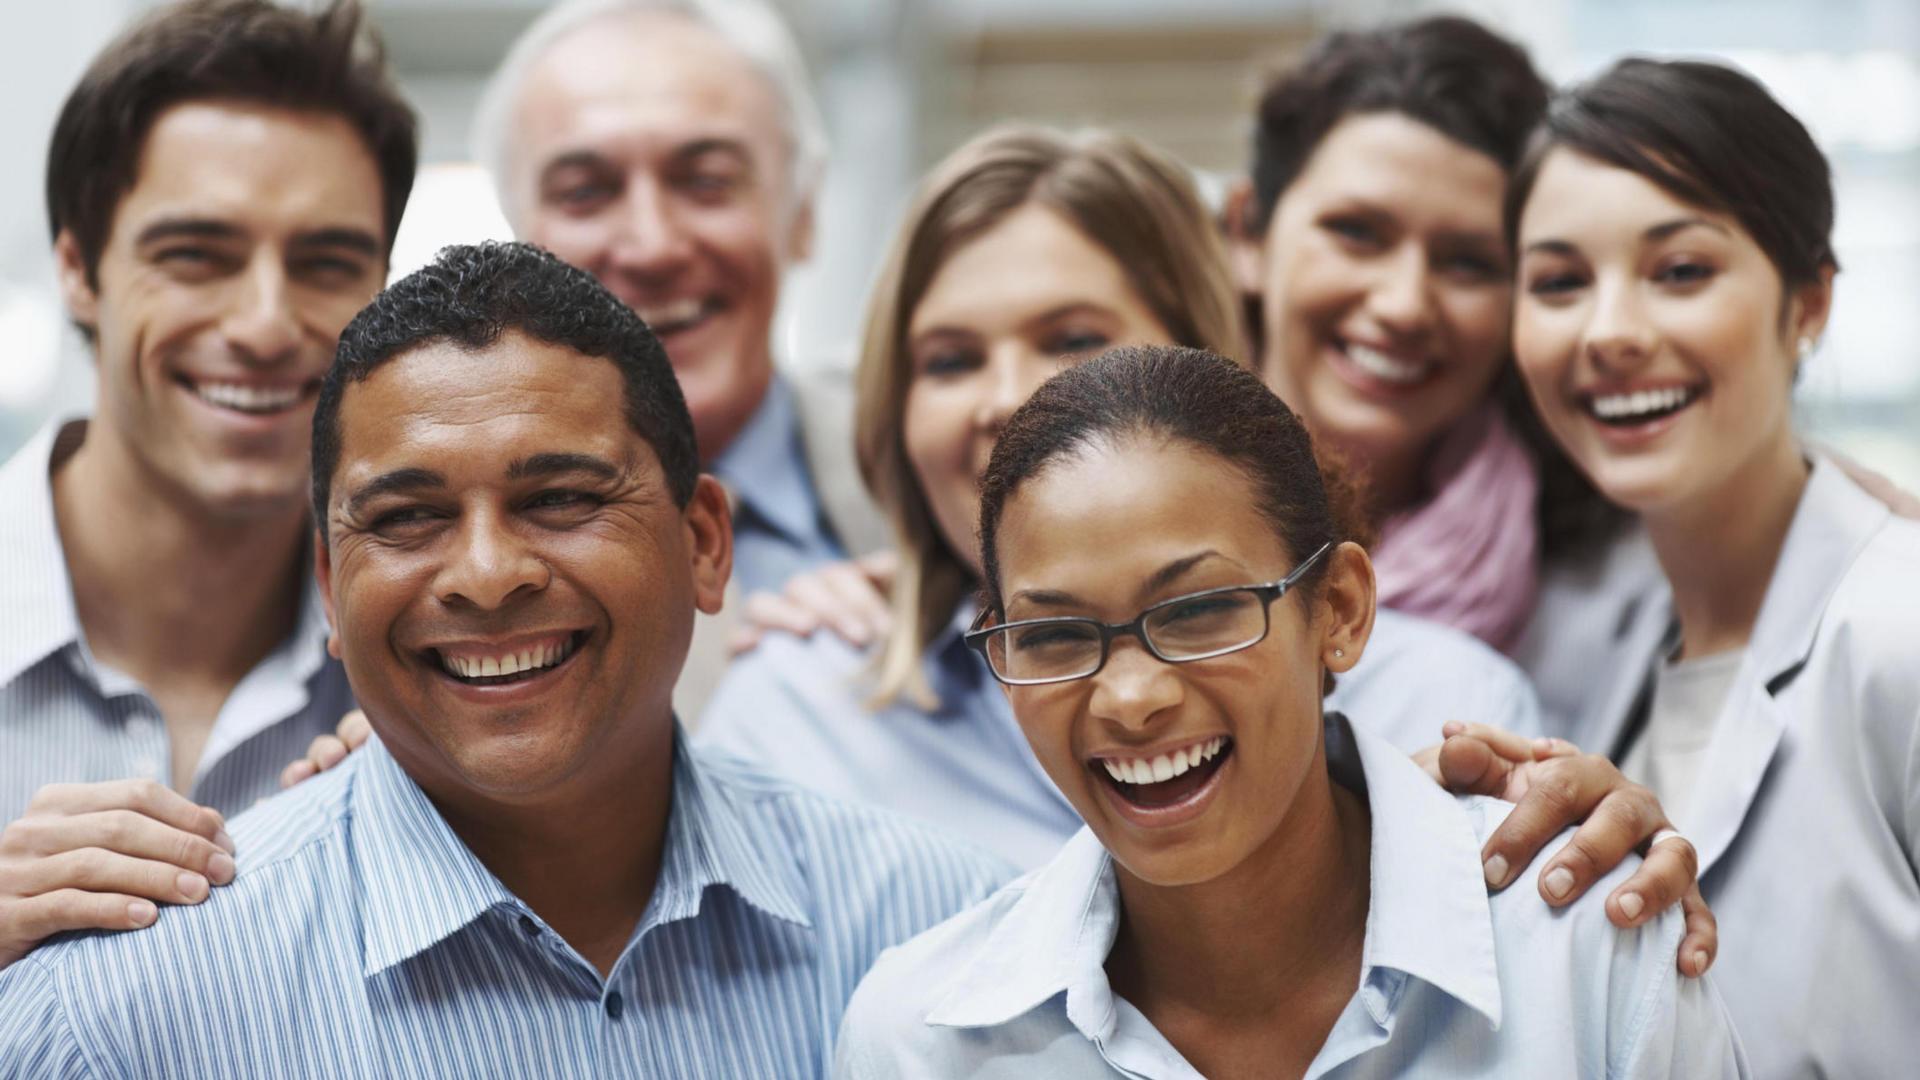 hospitality careers job openings benchmark resorts hotels careers